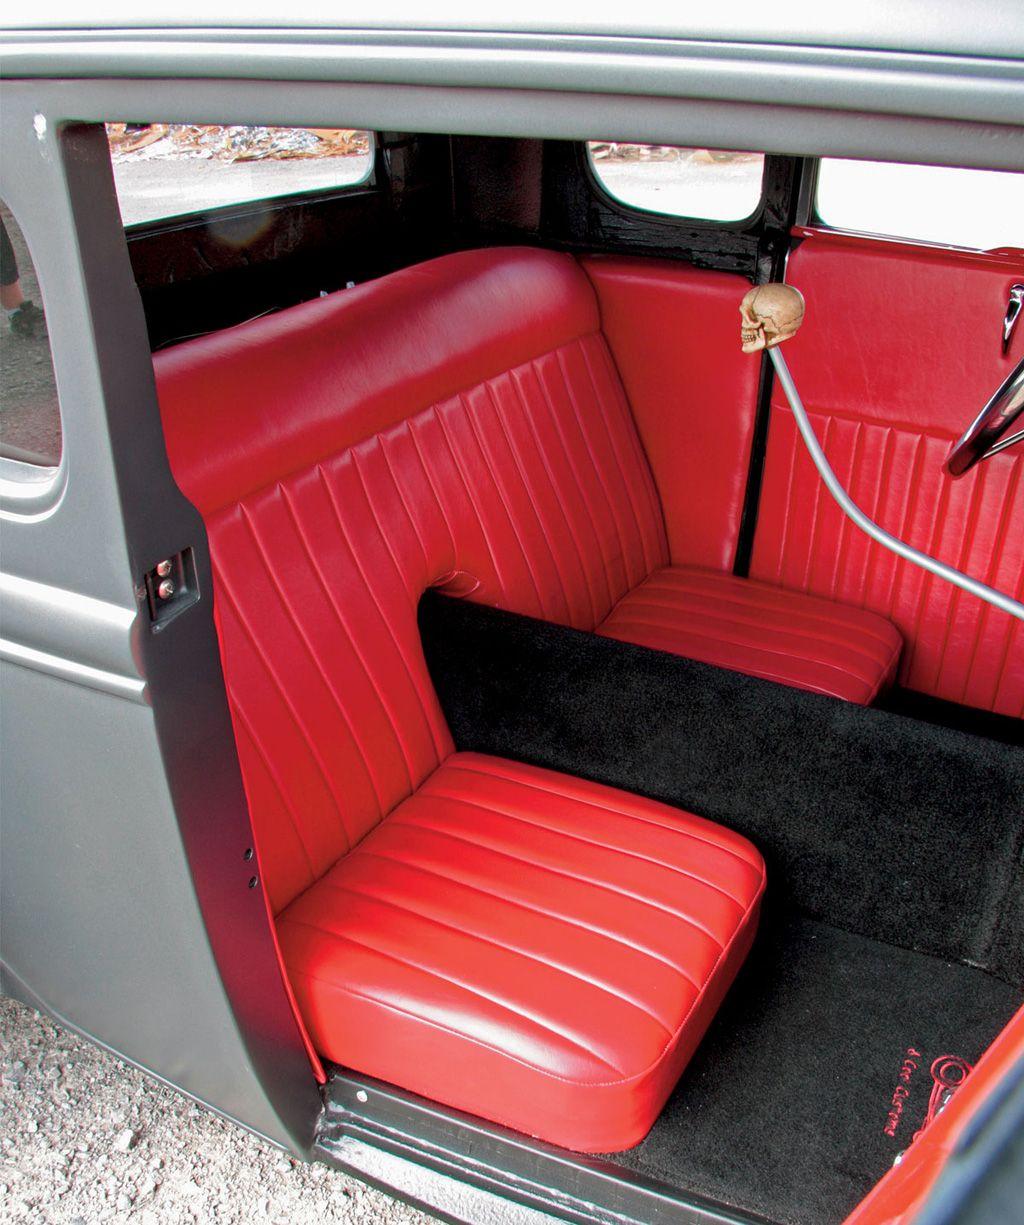 Салон хот рода 1930 Ford Model A Coupe Slammed